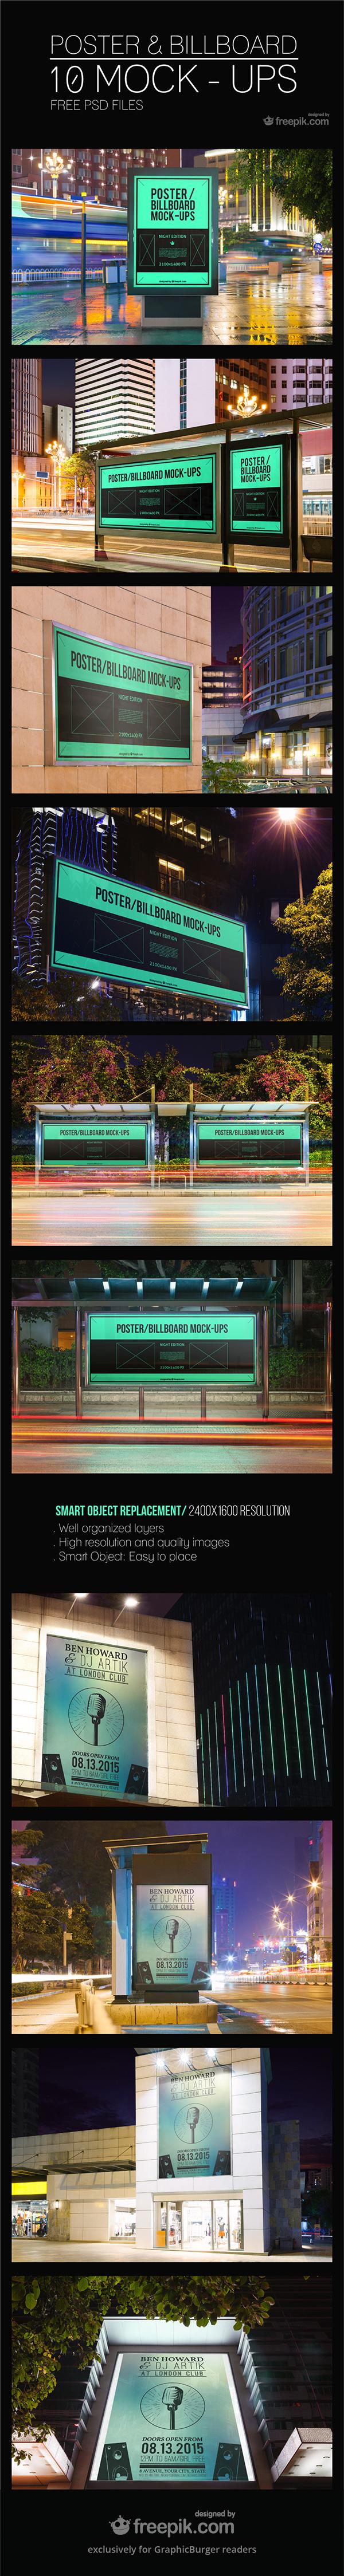 10-Poster-Billboard-Mockups-600